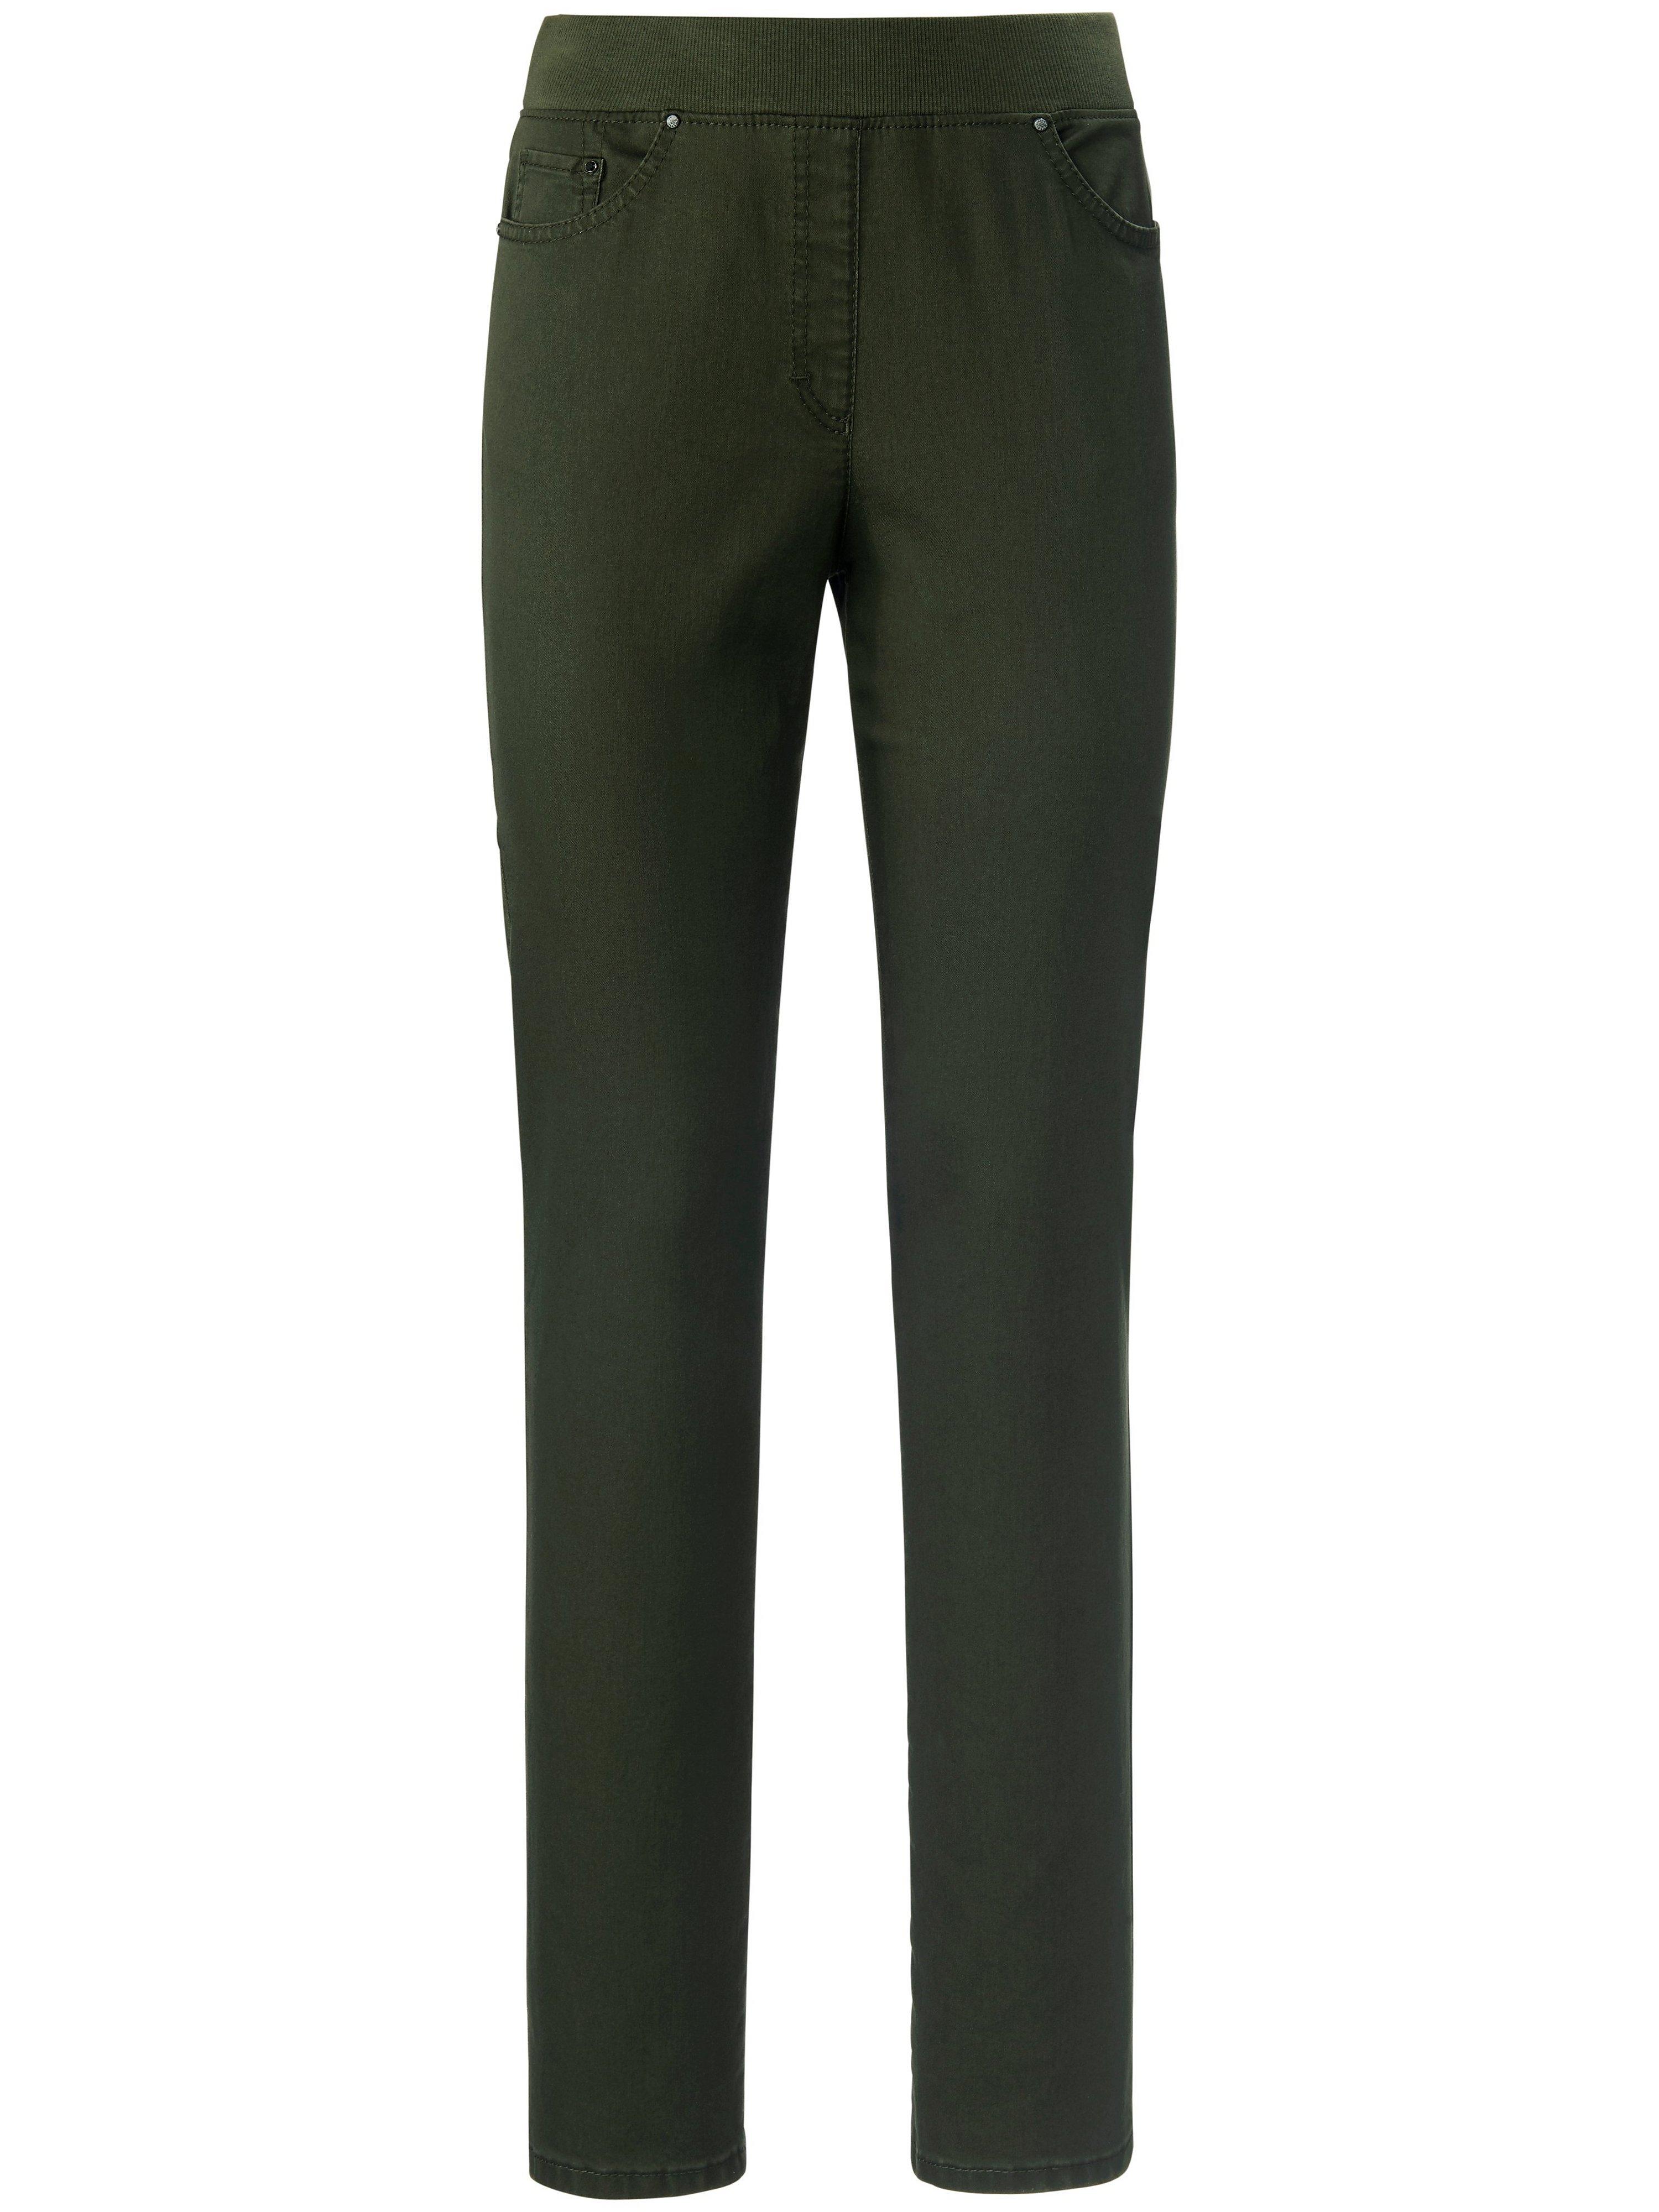 ProForm Slim-jeans model Pamina Van Raphaela by Brax groen